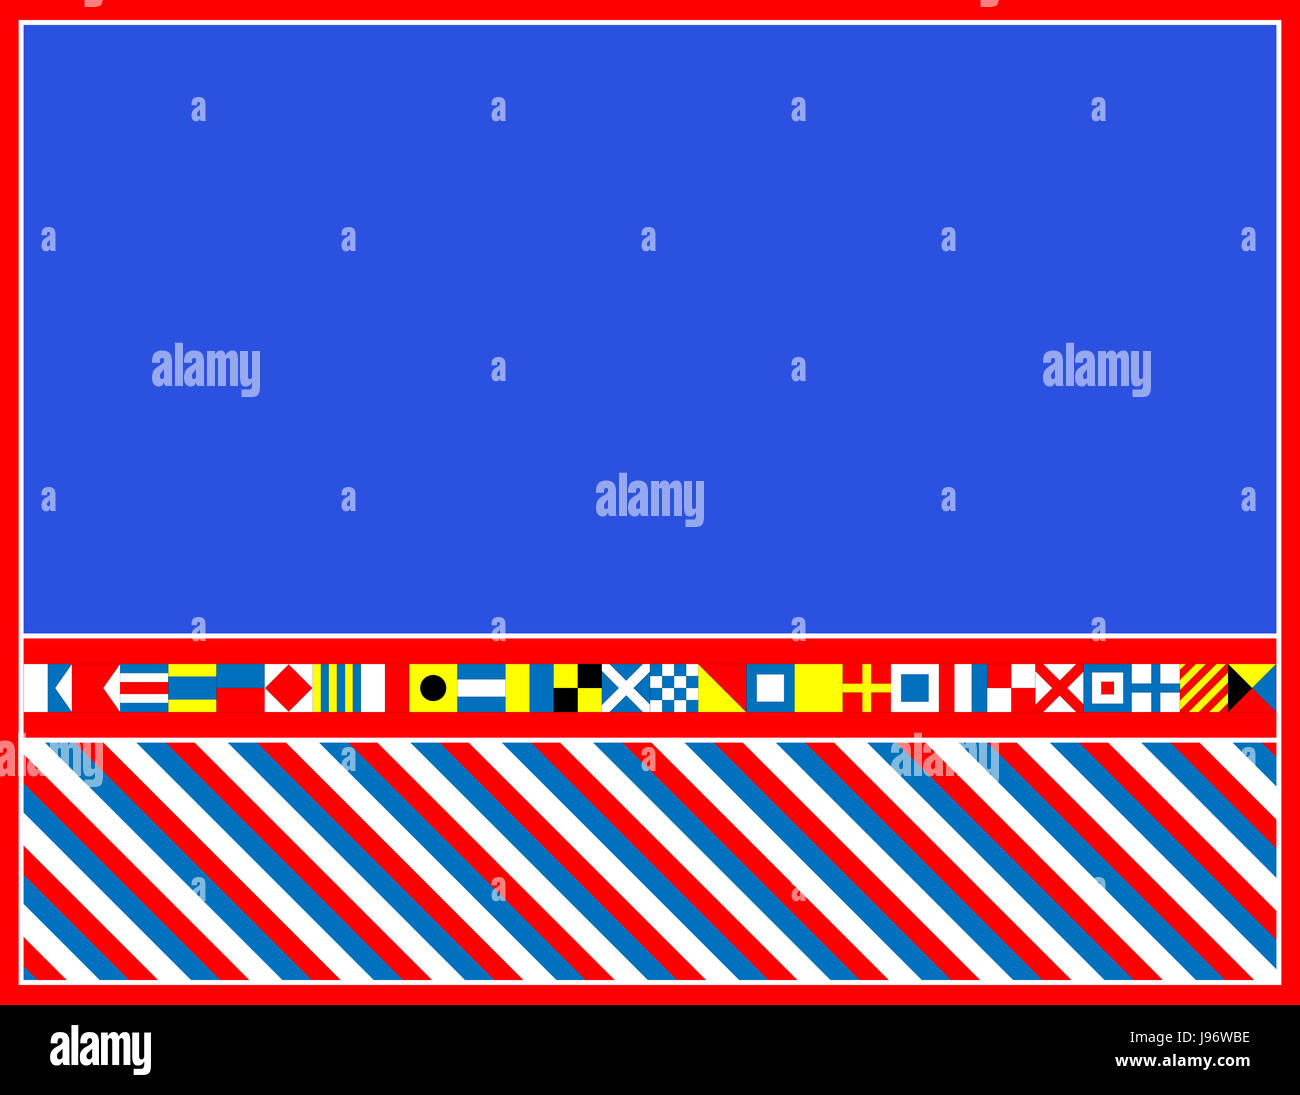 blau, Flagge, nautische, Rahmen, Rahmen, weiß, rot, Rahmen, Zeichen ...